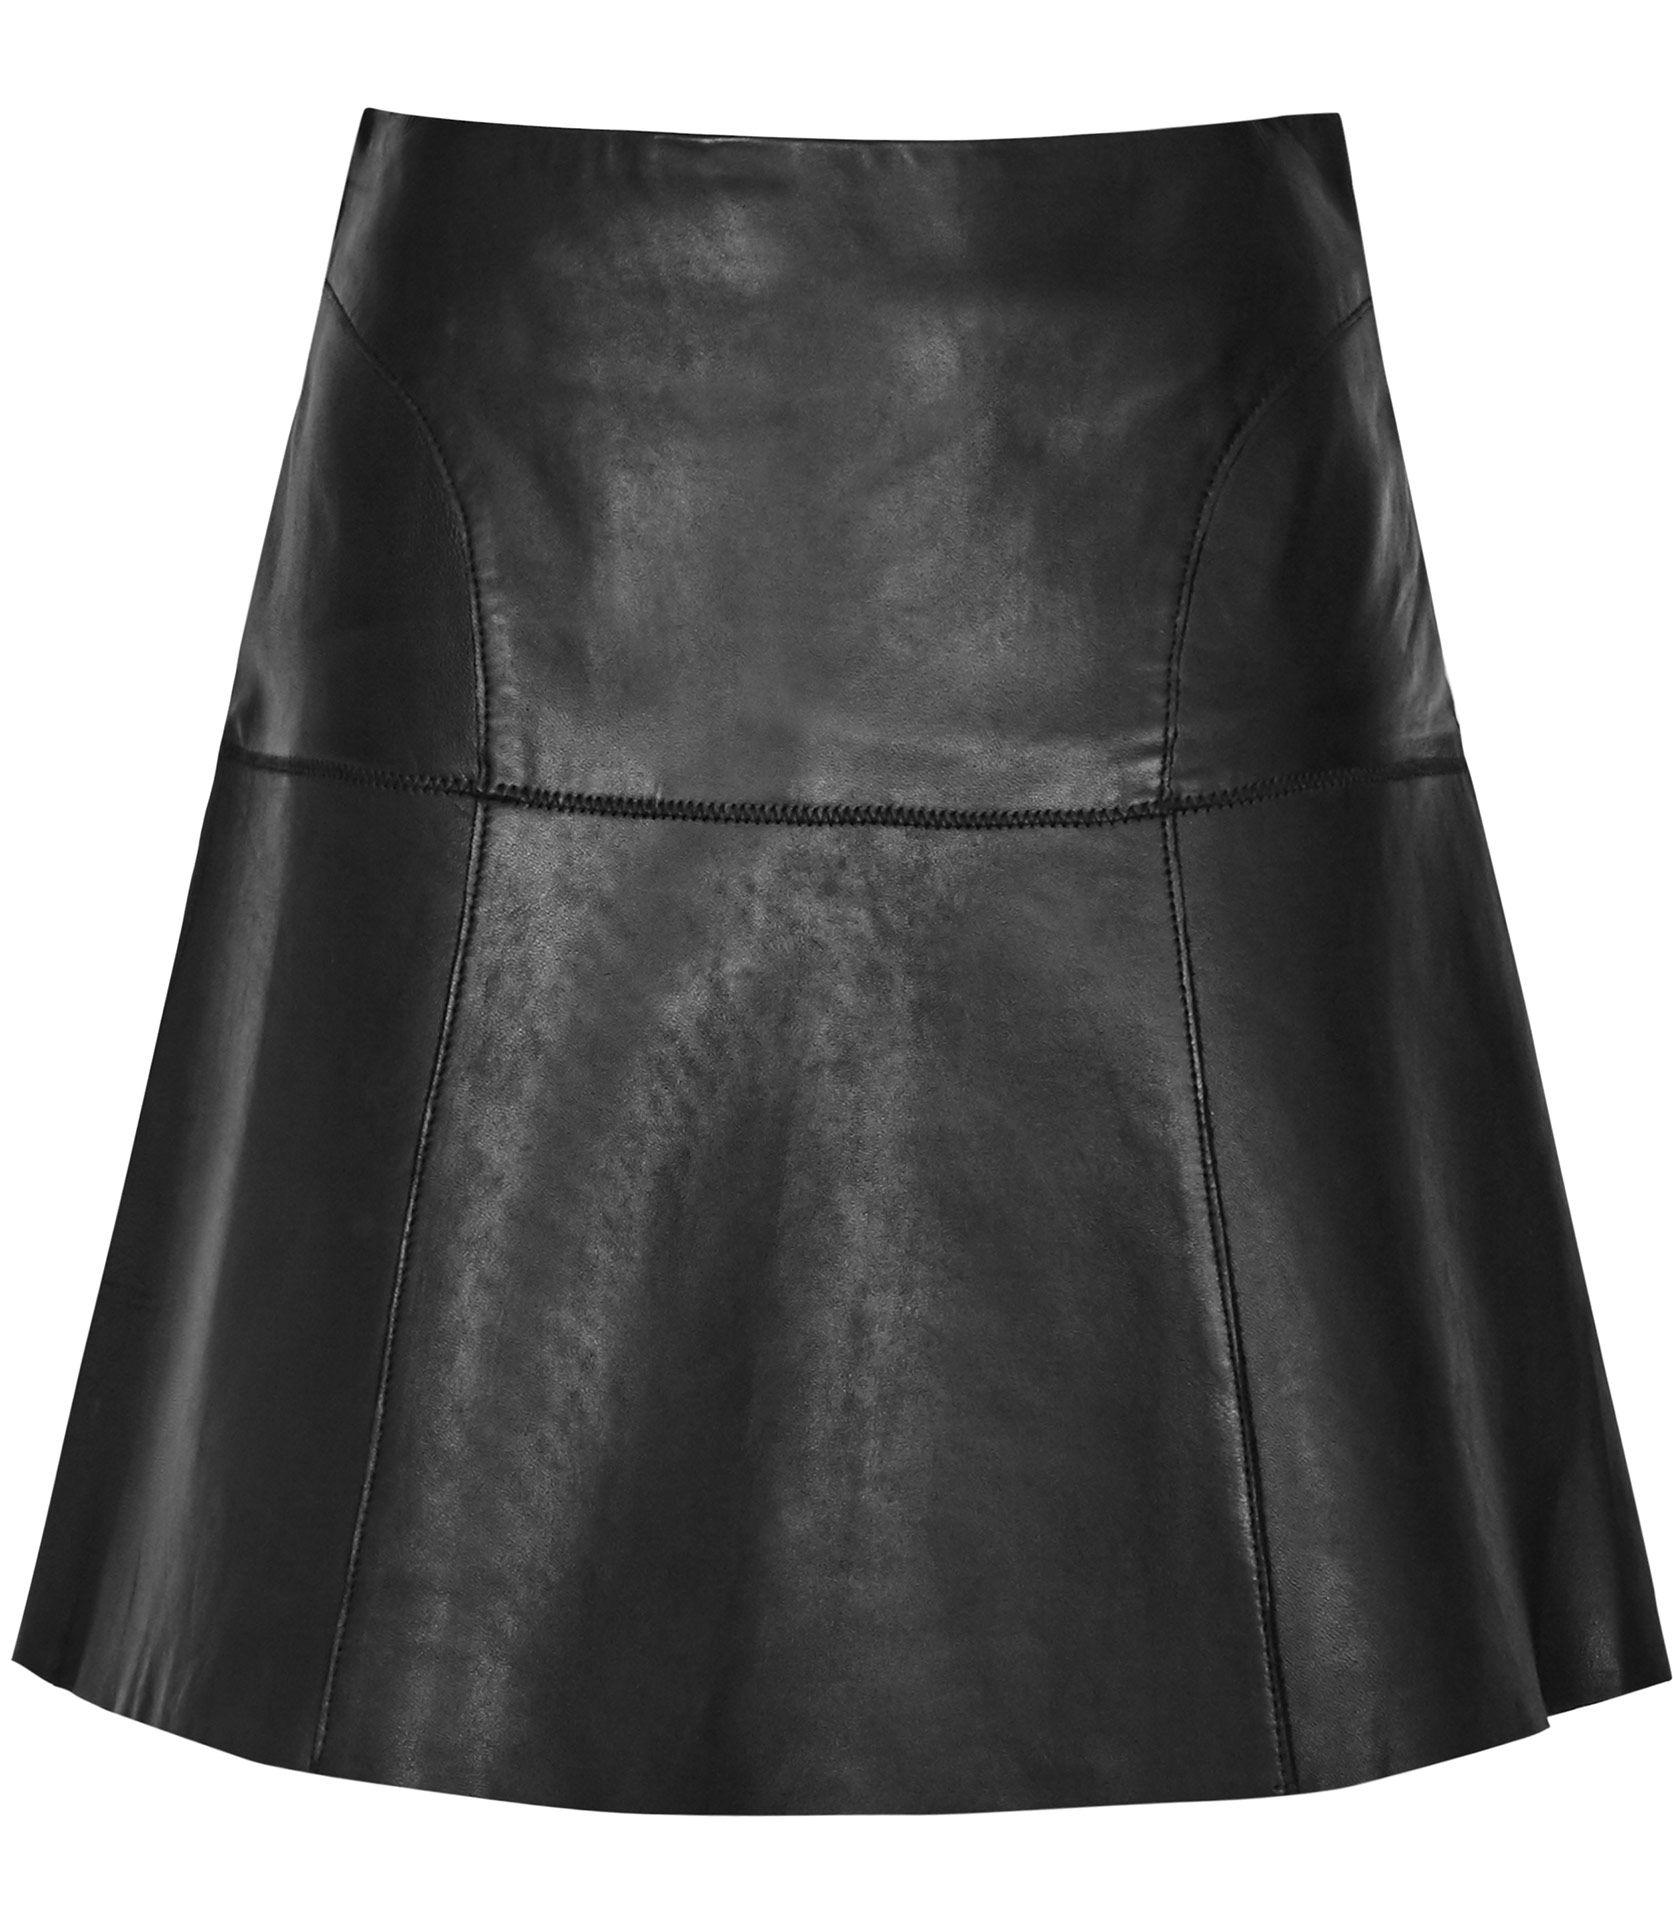 Fashion · Womens Black Leather A-line Mini Skirt ...